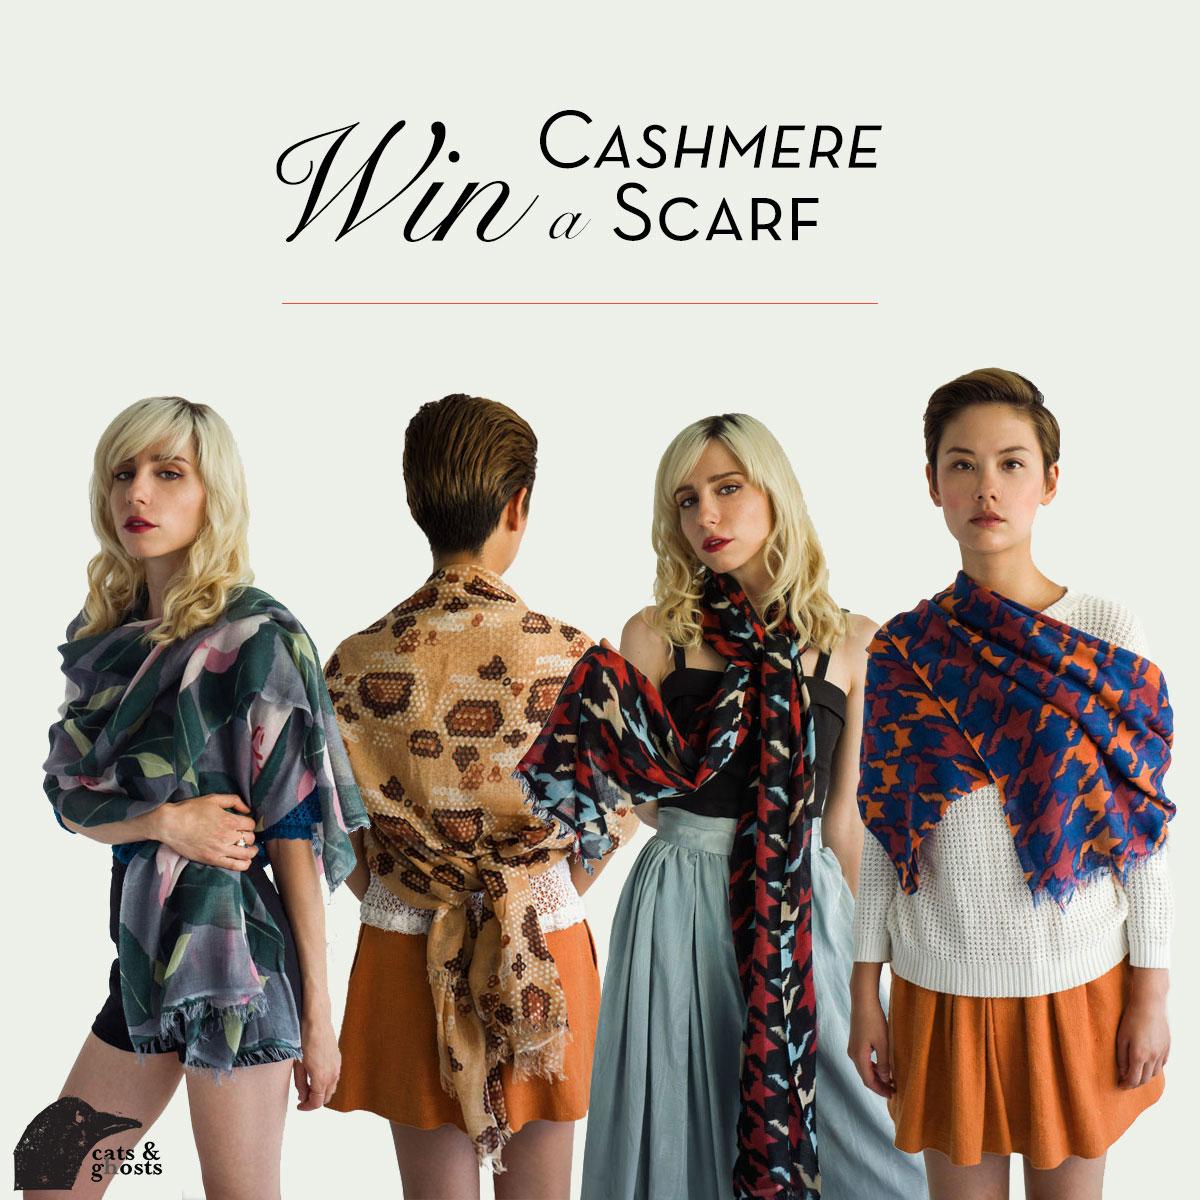 Win a Cashmere Scarf